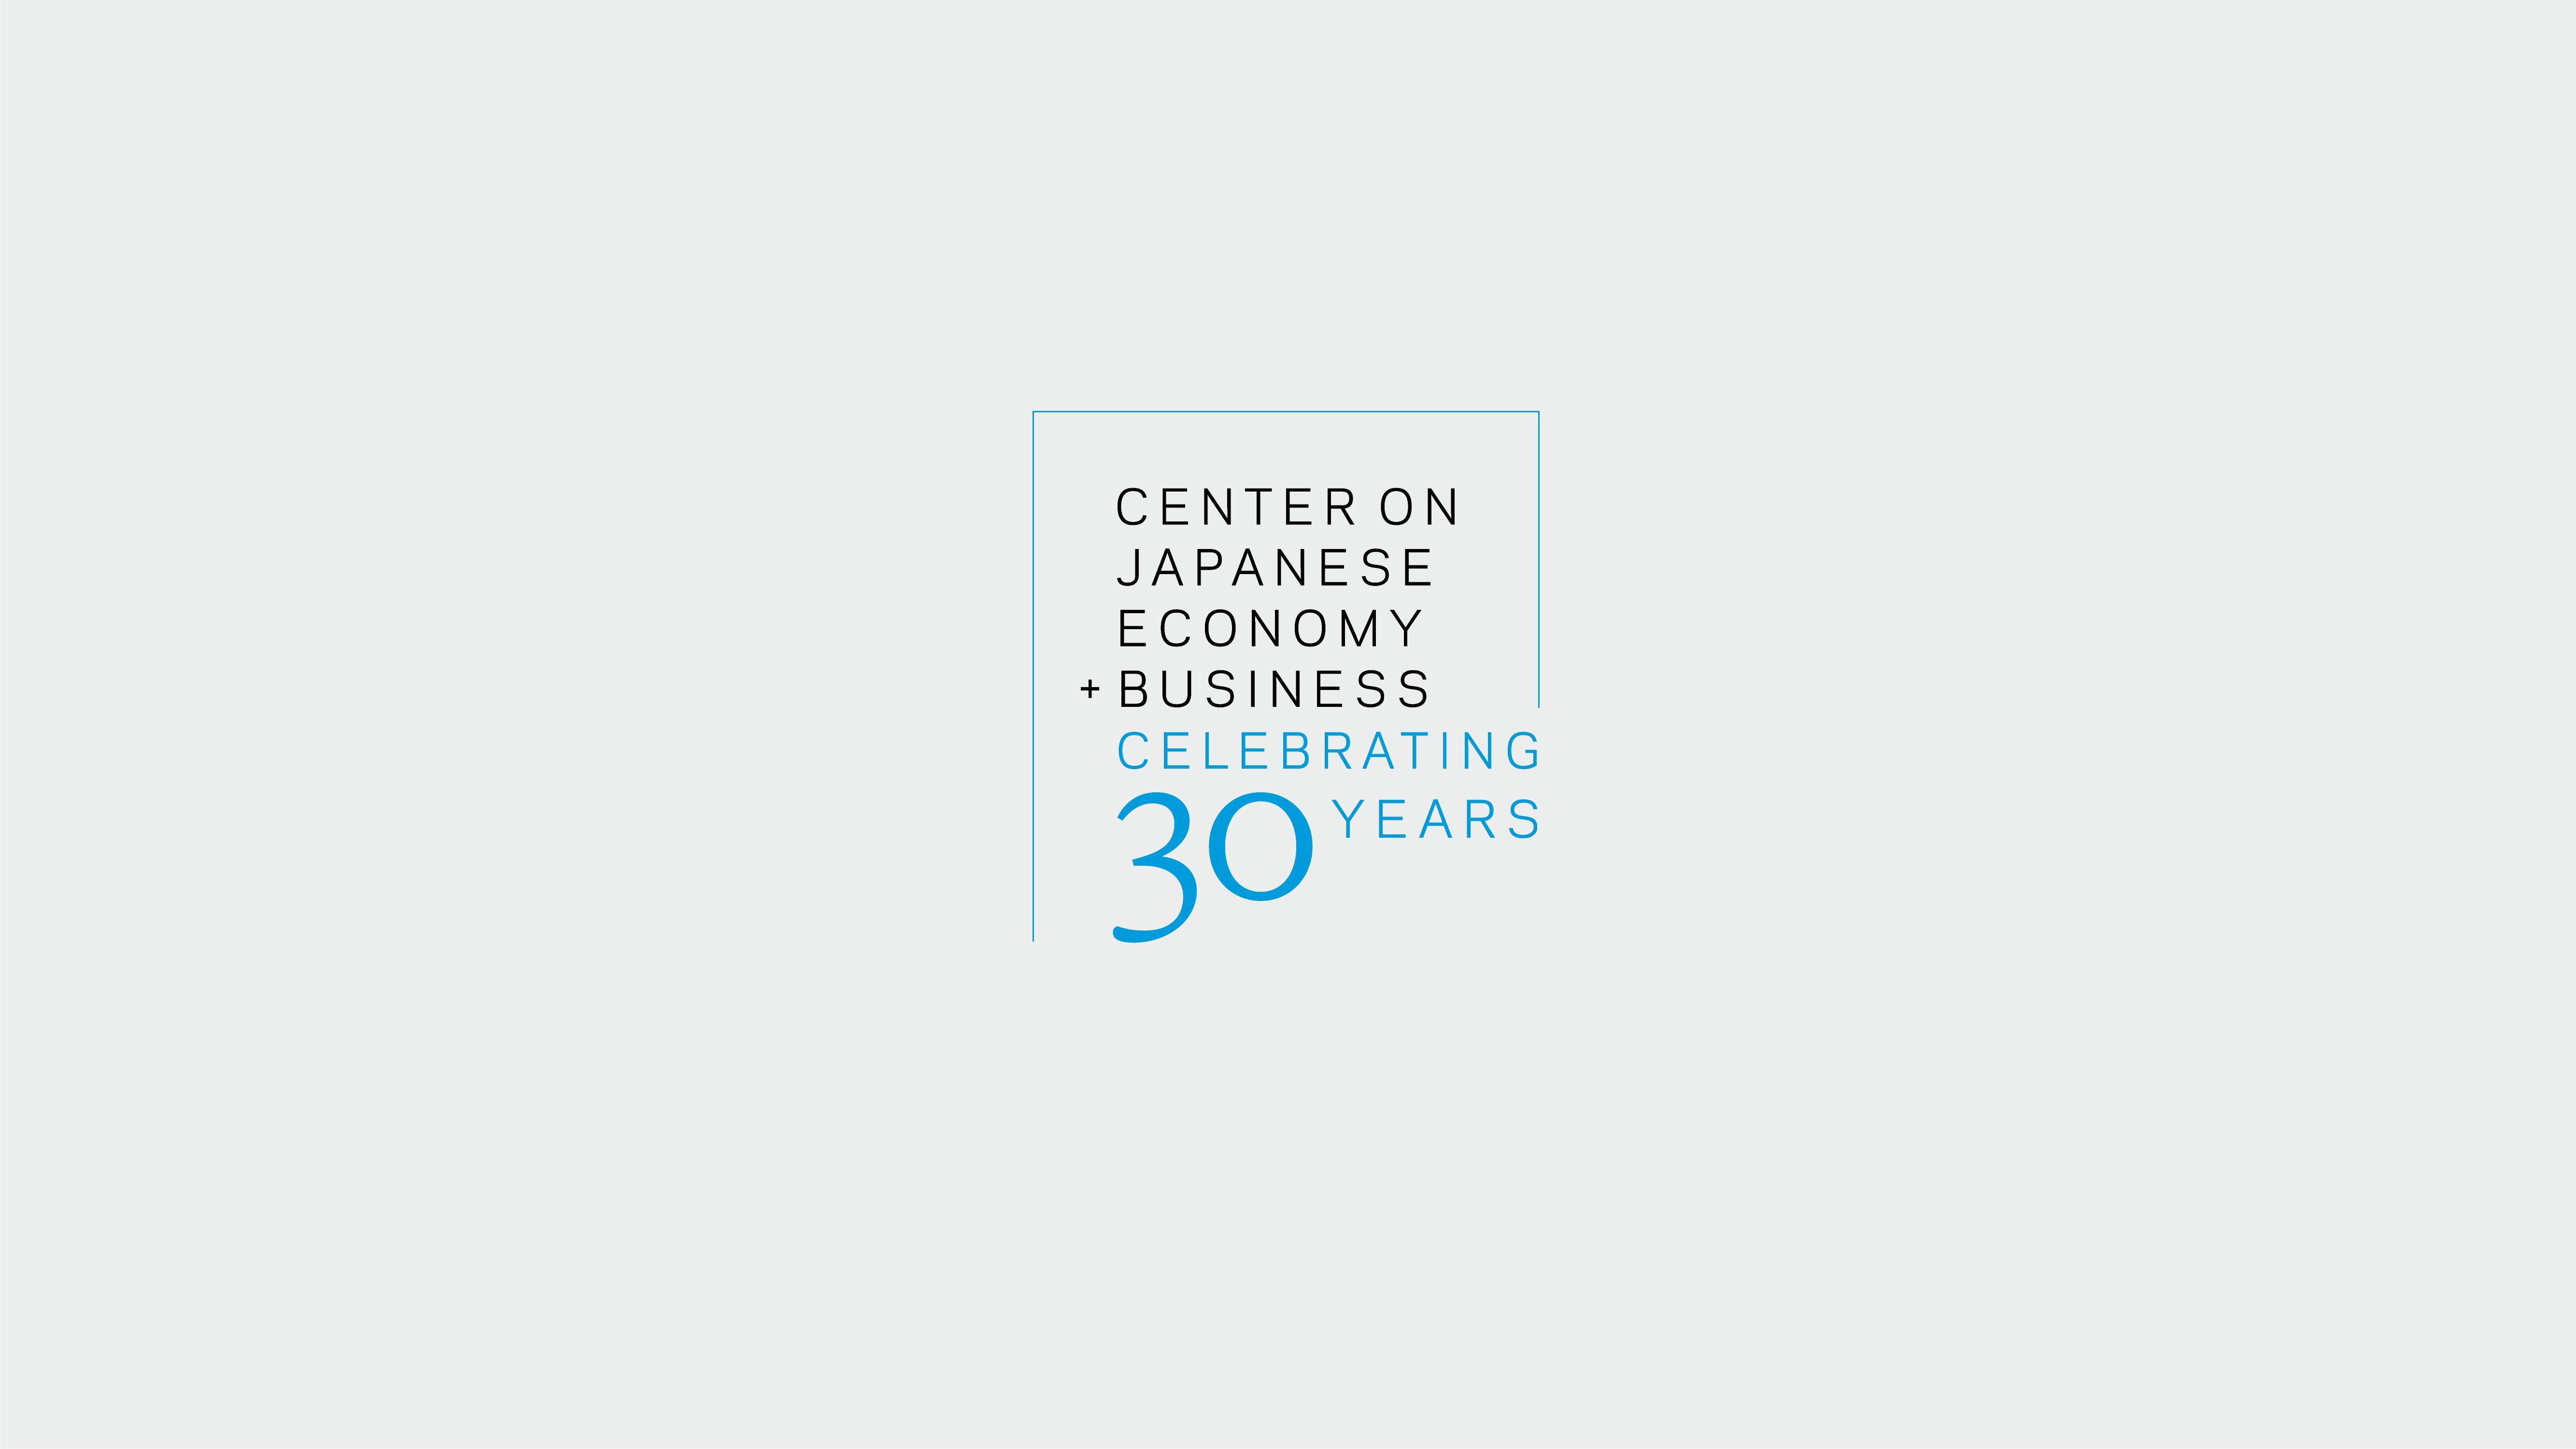 Center on Japanese Business